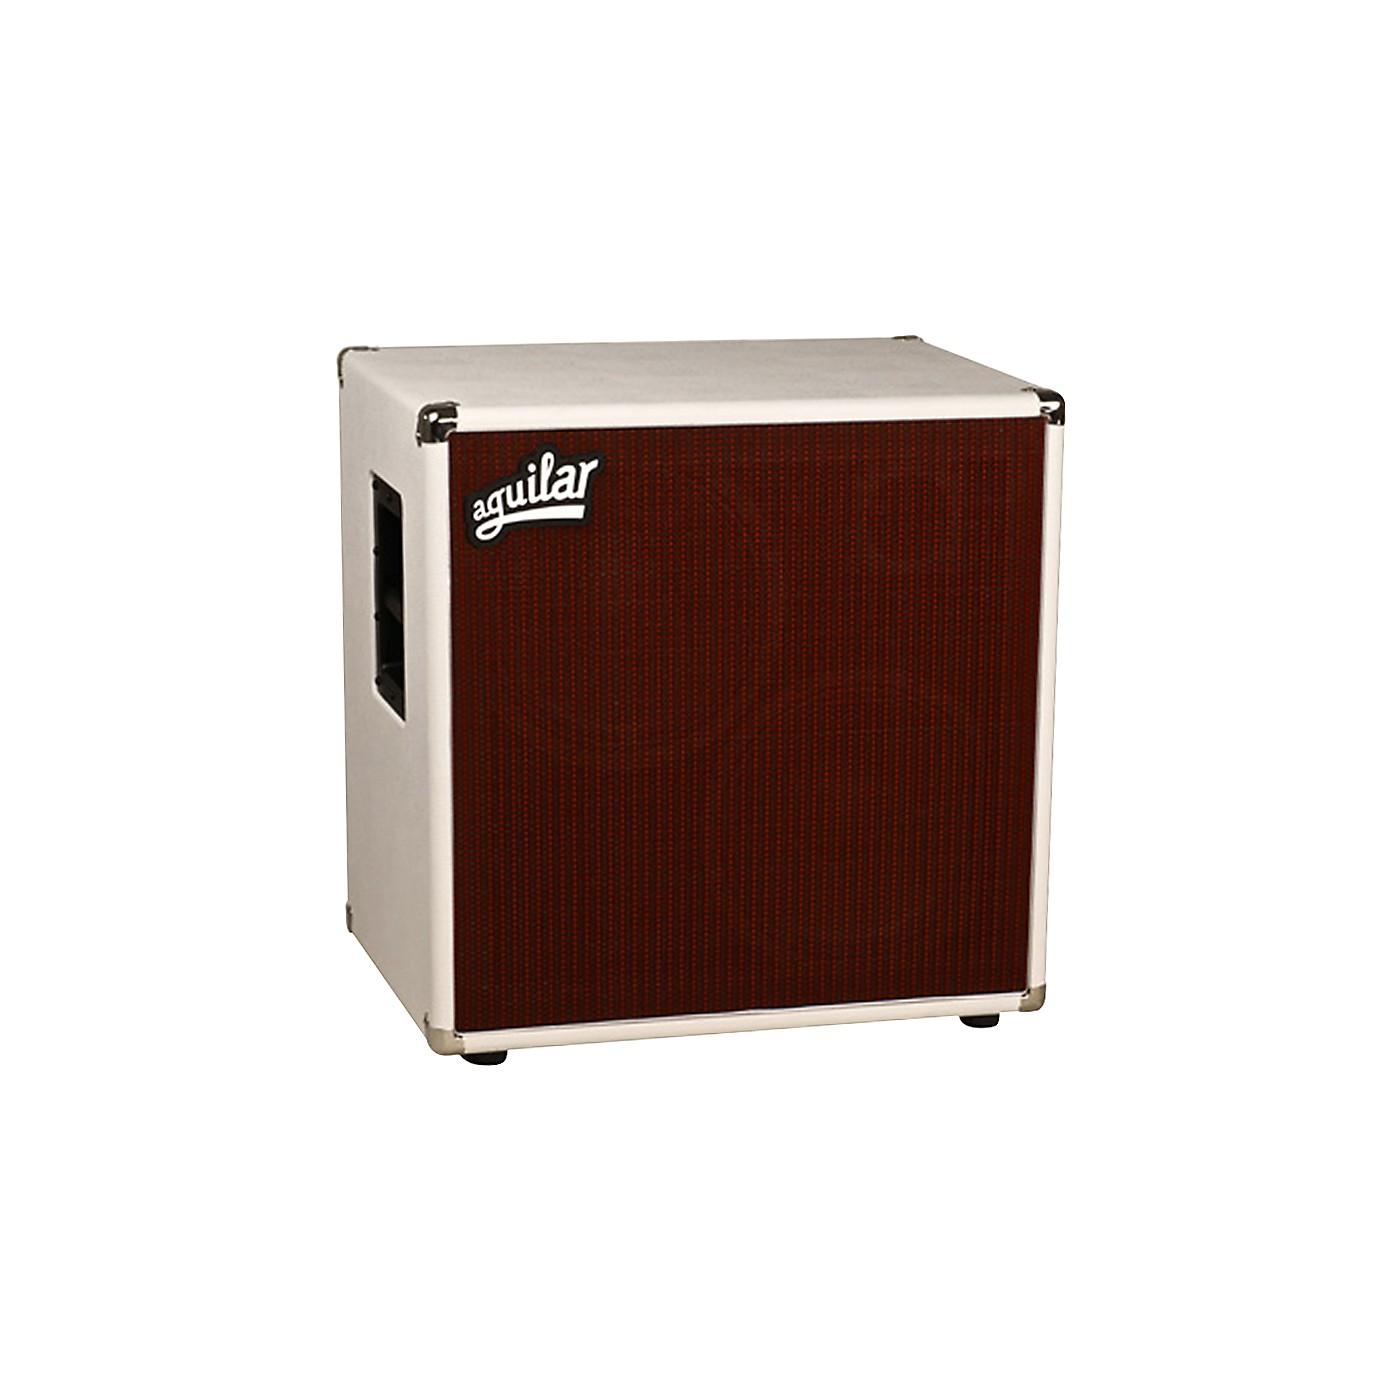 Aguilar DB 212 2x12 Bass Speaker Cabinet thumbnail